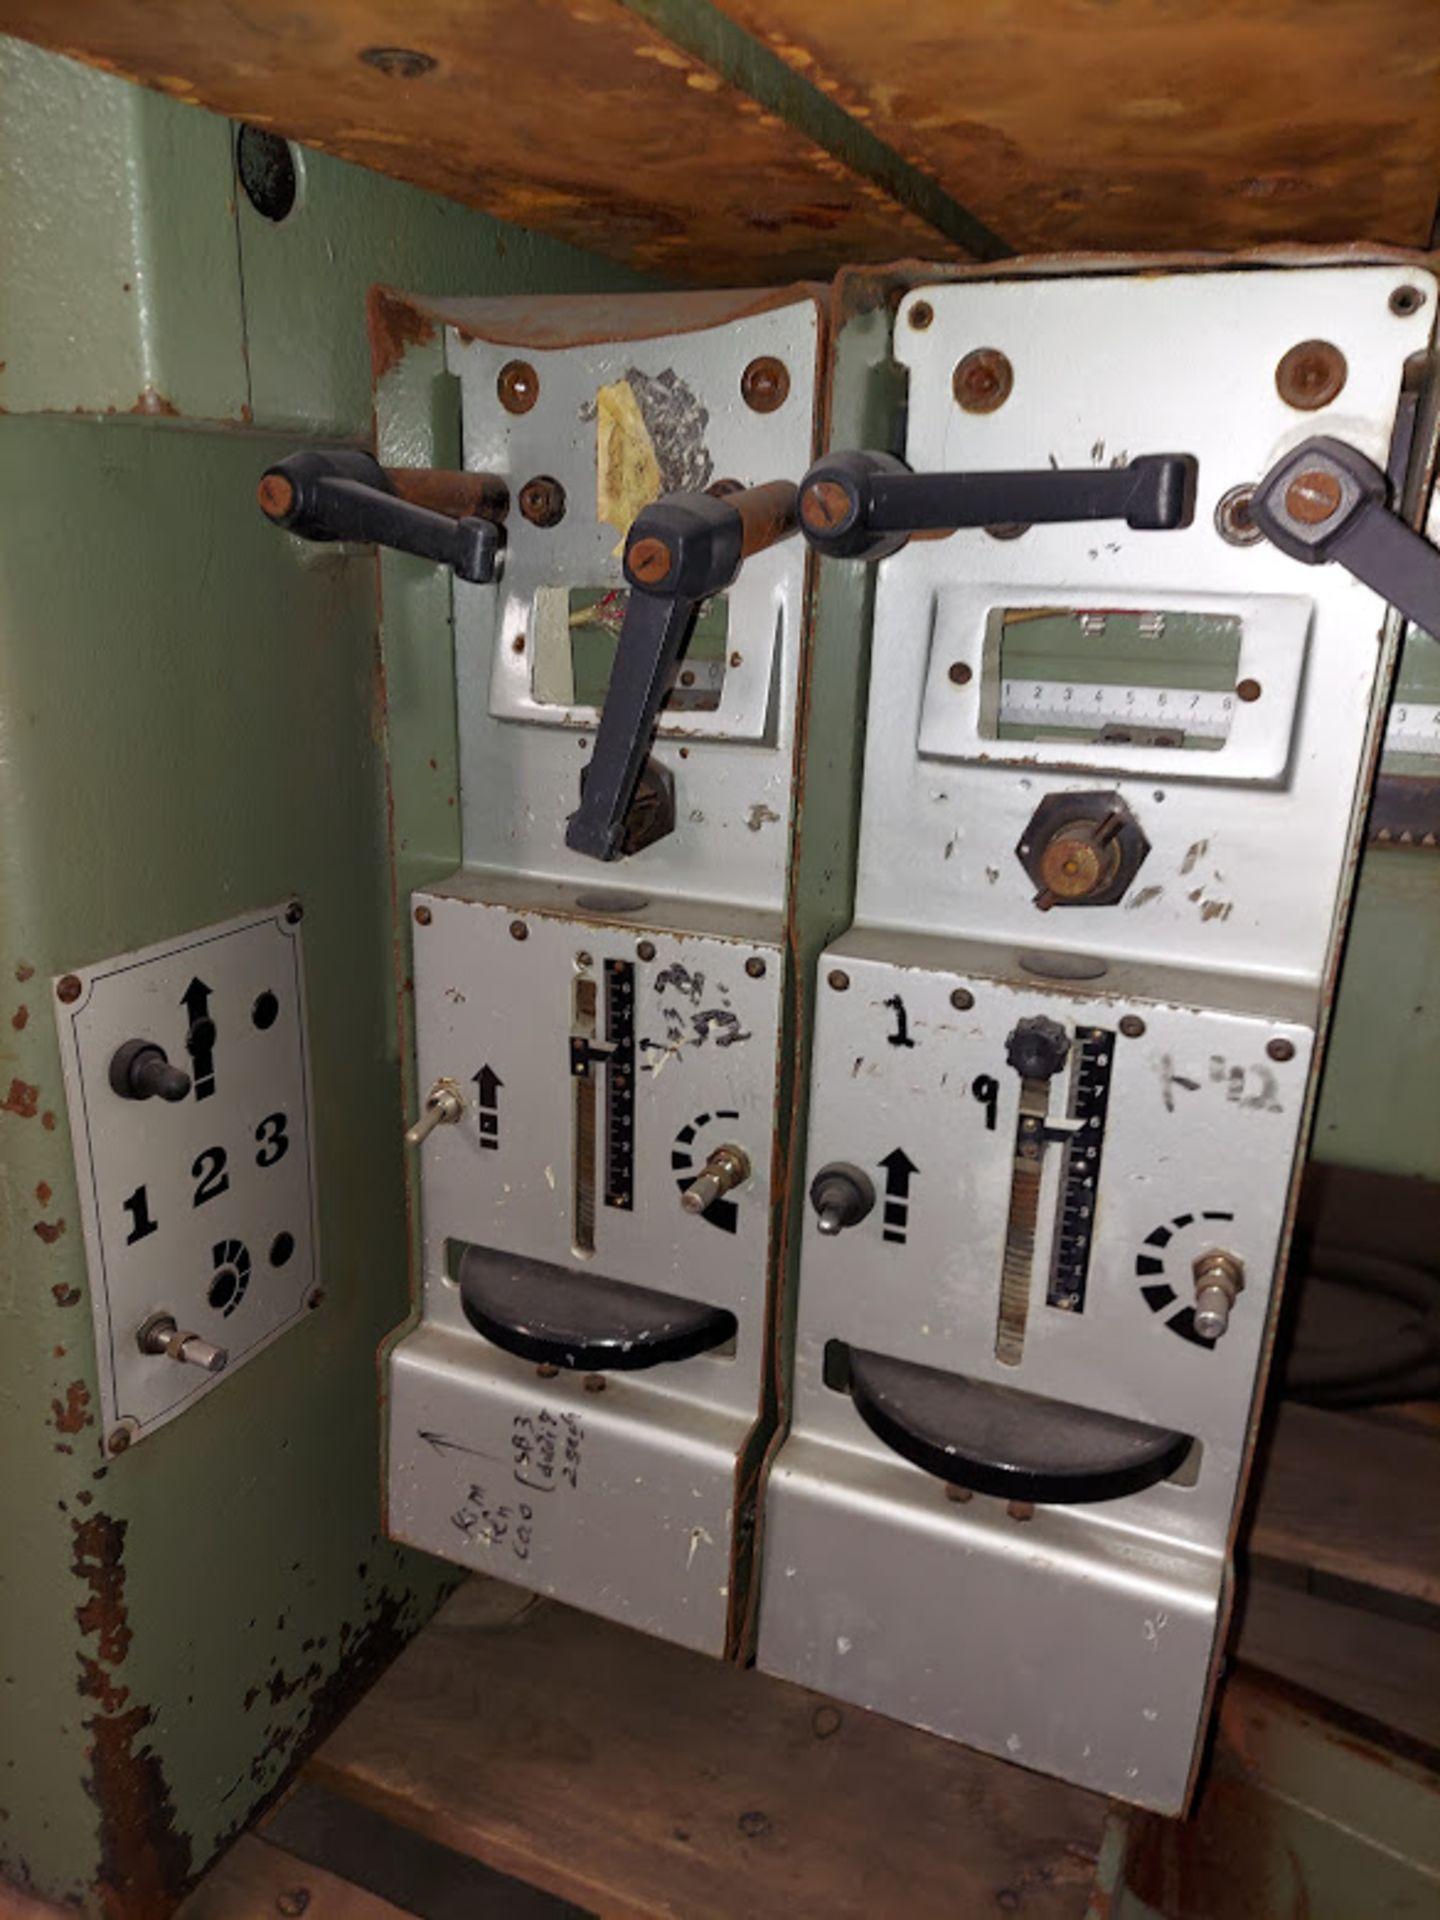 Zangheri & Boschetti Mulit Mat P3 Line Boring Machine, Model #MP3, 1 - 21 Spindle Horizontal Drill - Image 7 of 7